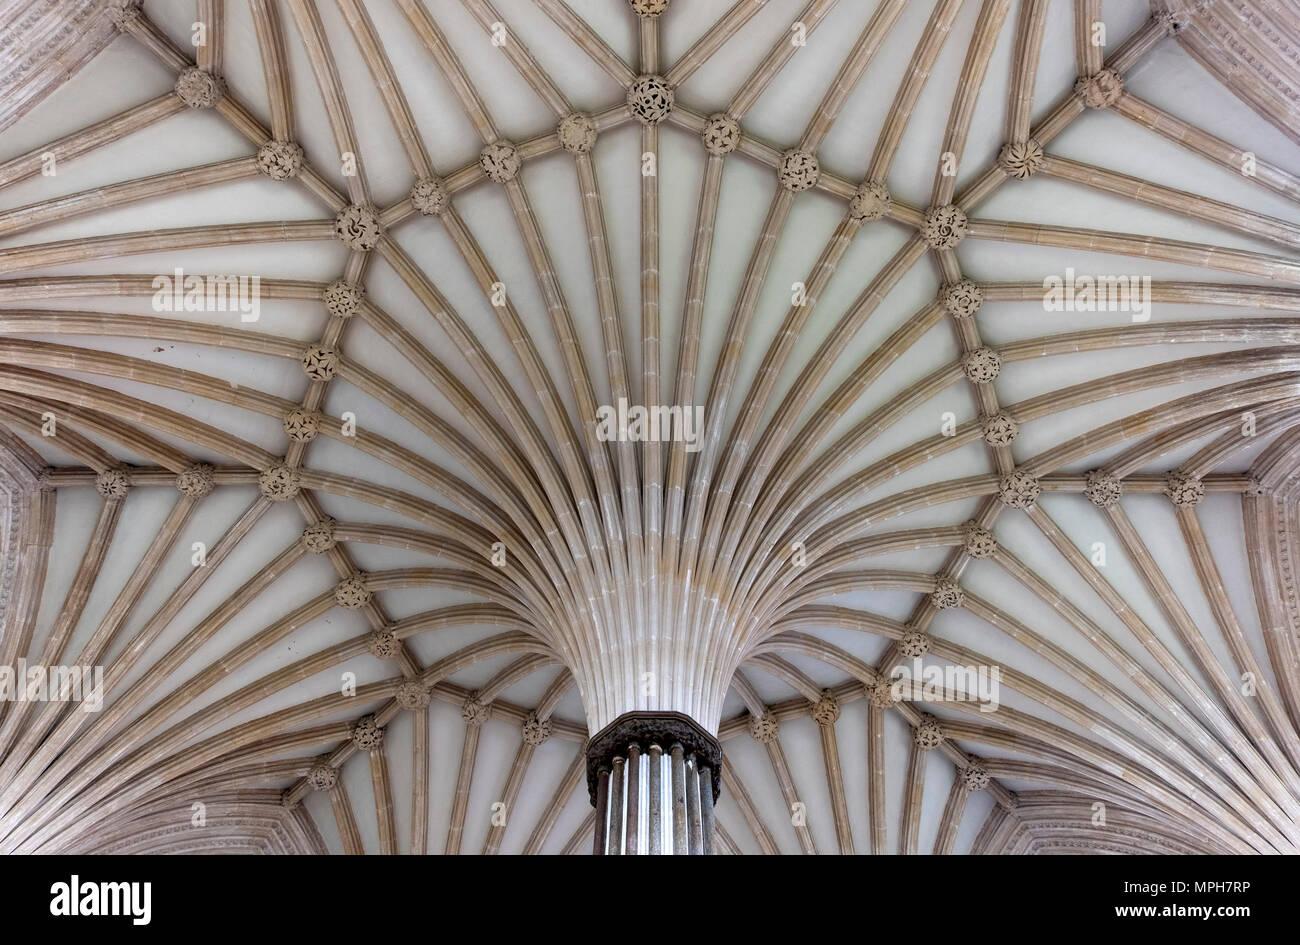 Wells, Cathedral, Kapitelsaal, Blick ins Gewölbe - Stock Image